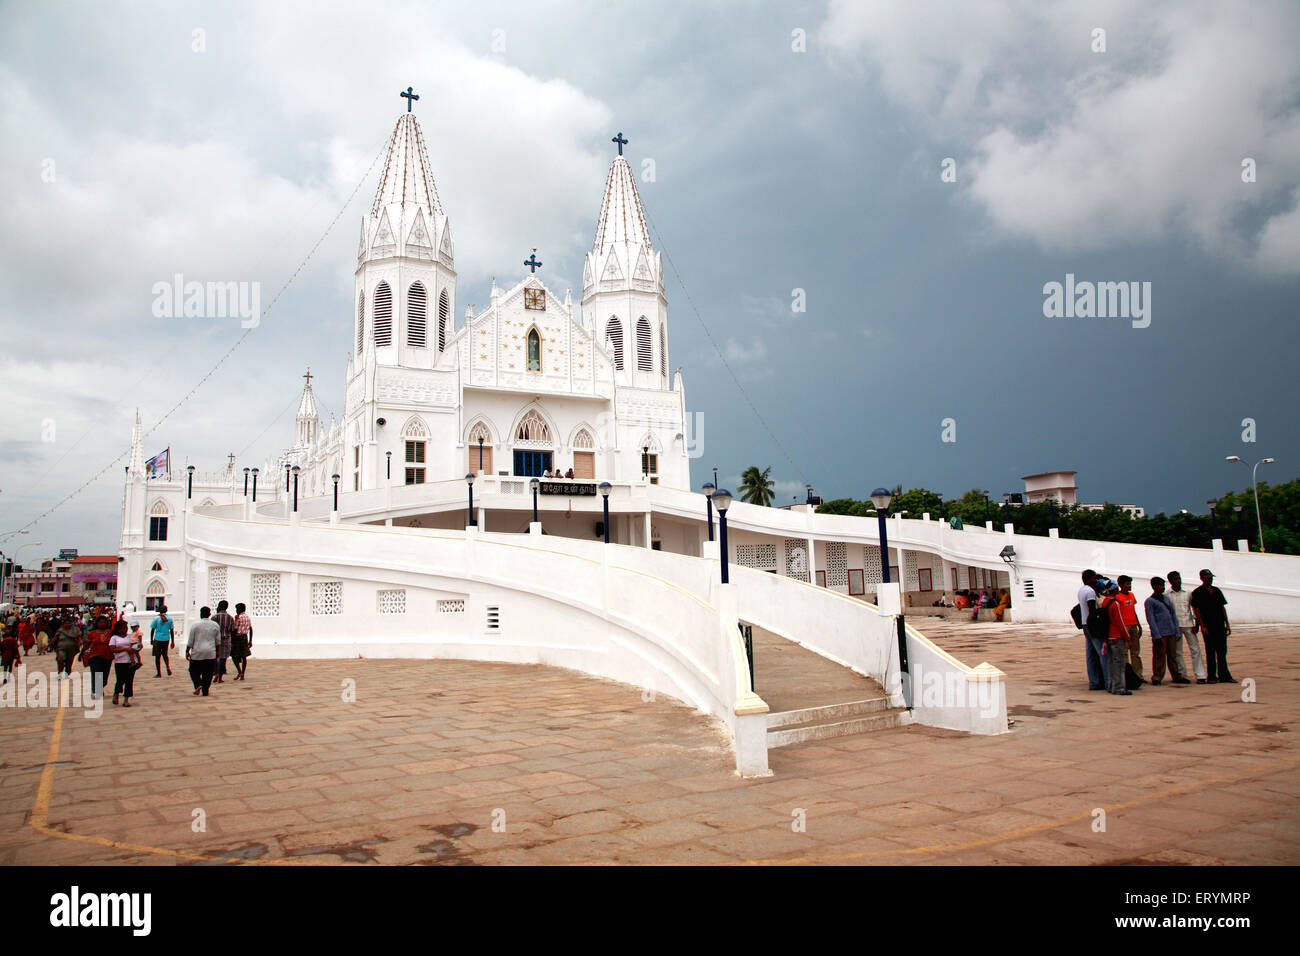 Iglesia de Nuestra Señora de la buena salud llamado nuestra señora de vailankanni ; Vailankanni Nagappattinam Velanganni ; Foto de stock